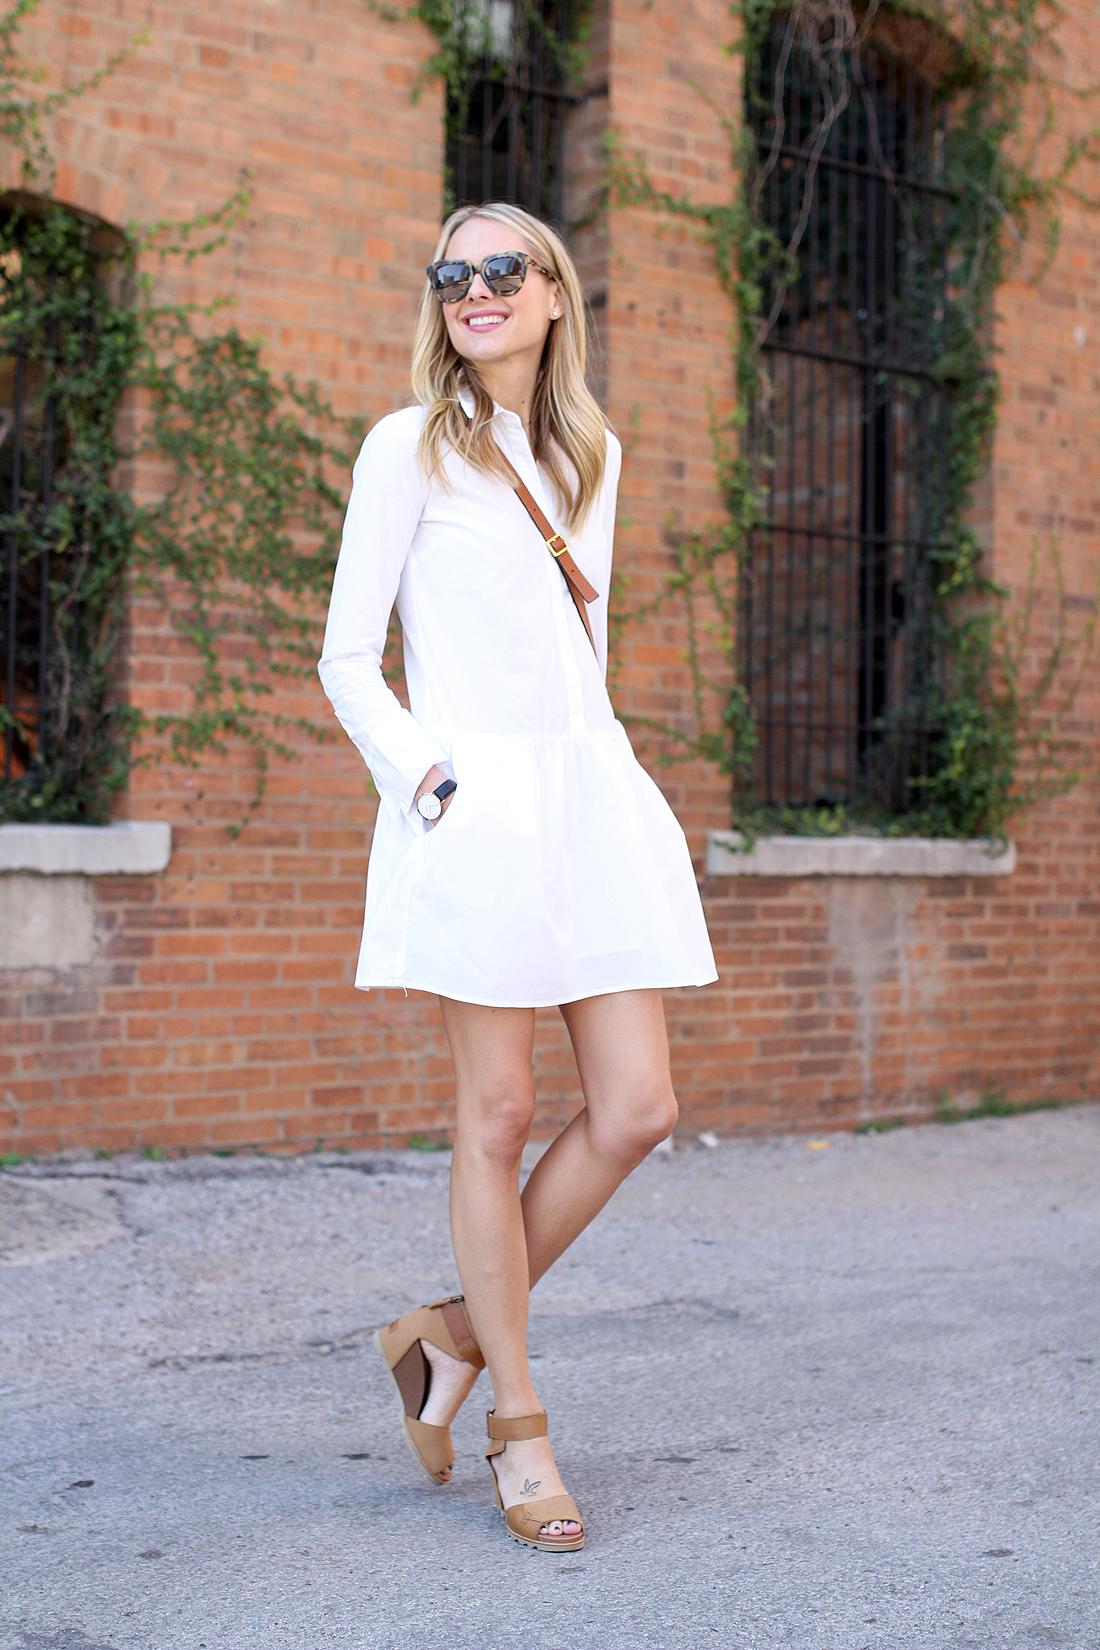 fashion-jackson-karen-walker-sunglasses-splendid-damsel-white-shirtdress-sorel-joanine-sandals